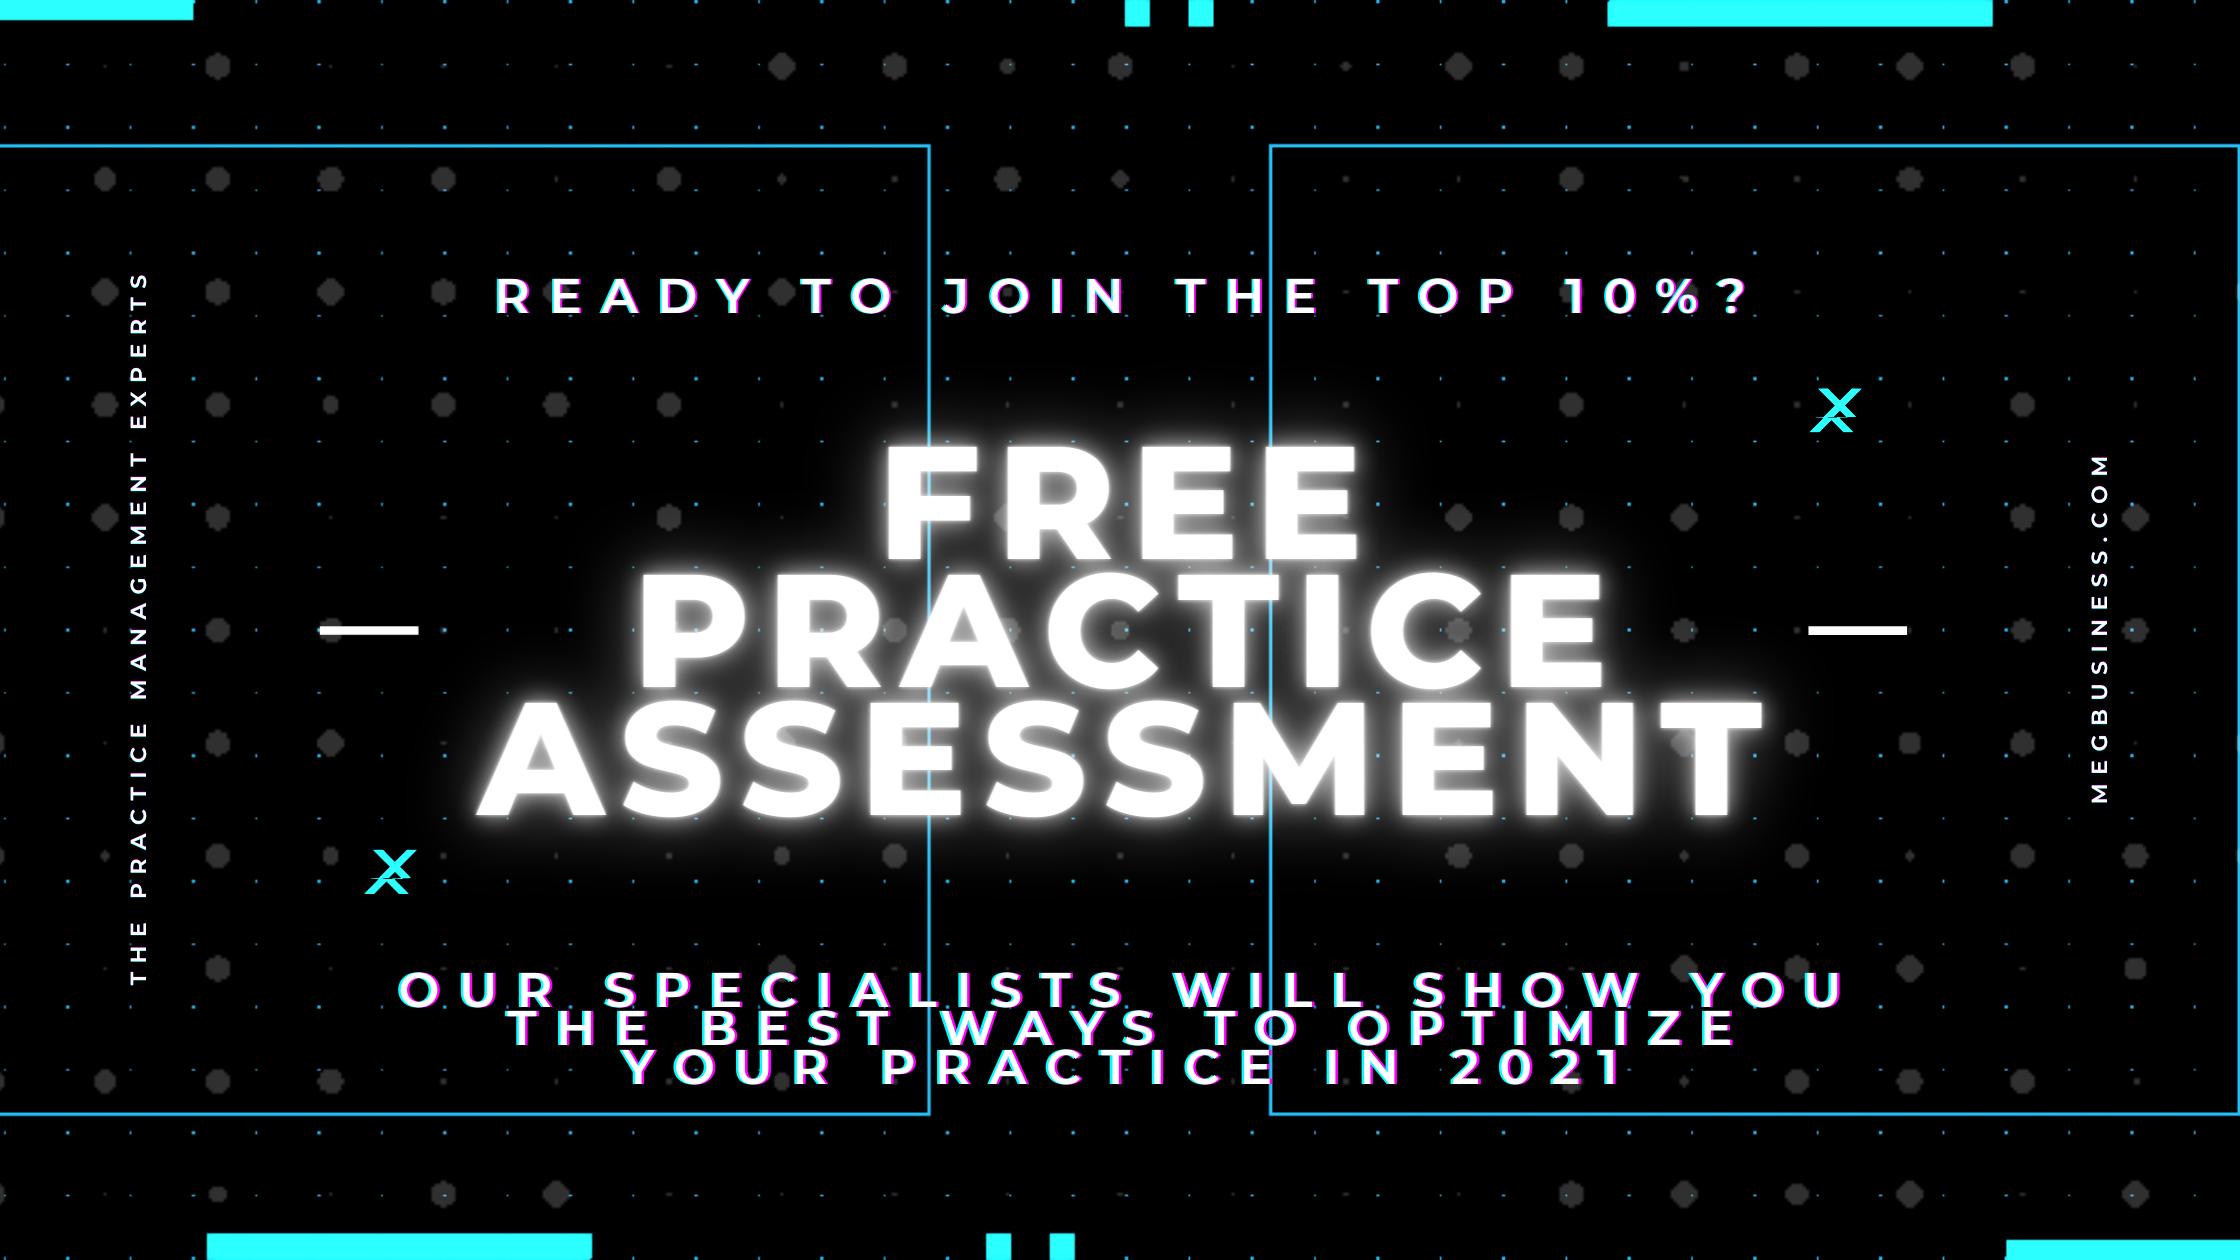 Free Practice Assessment from MEG